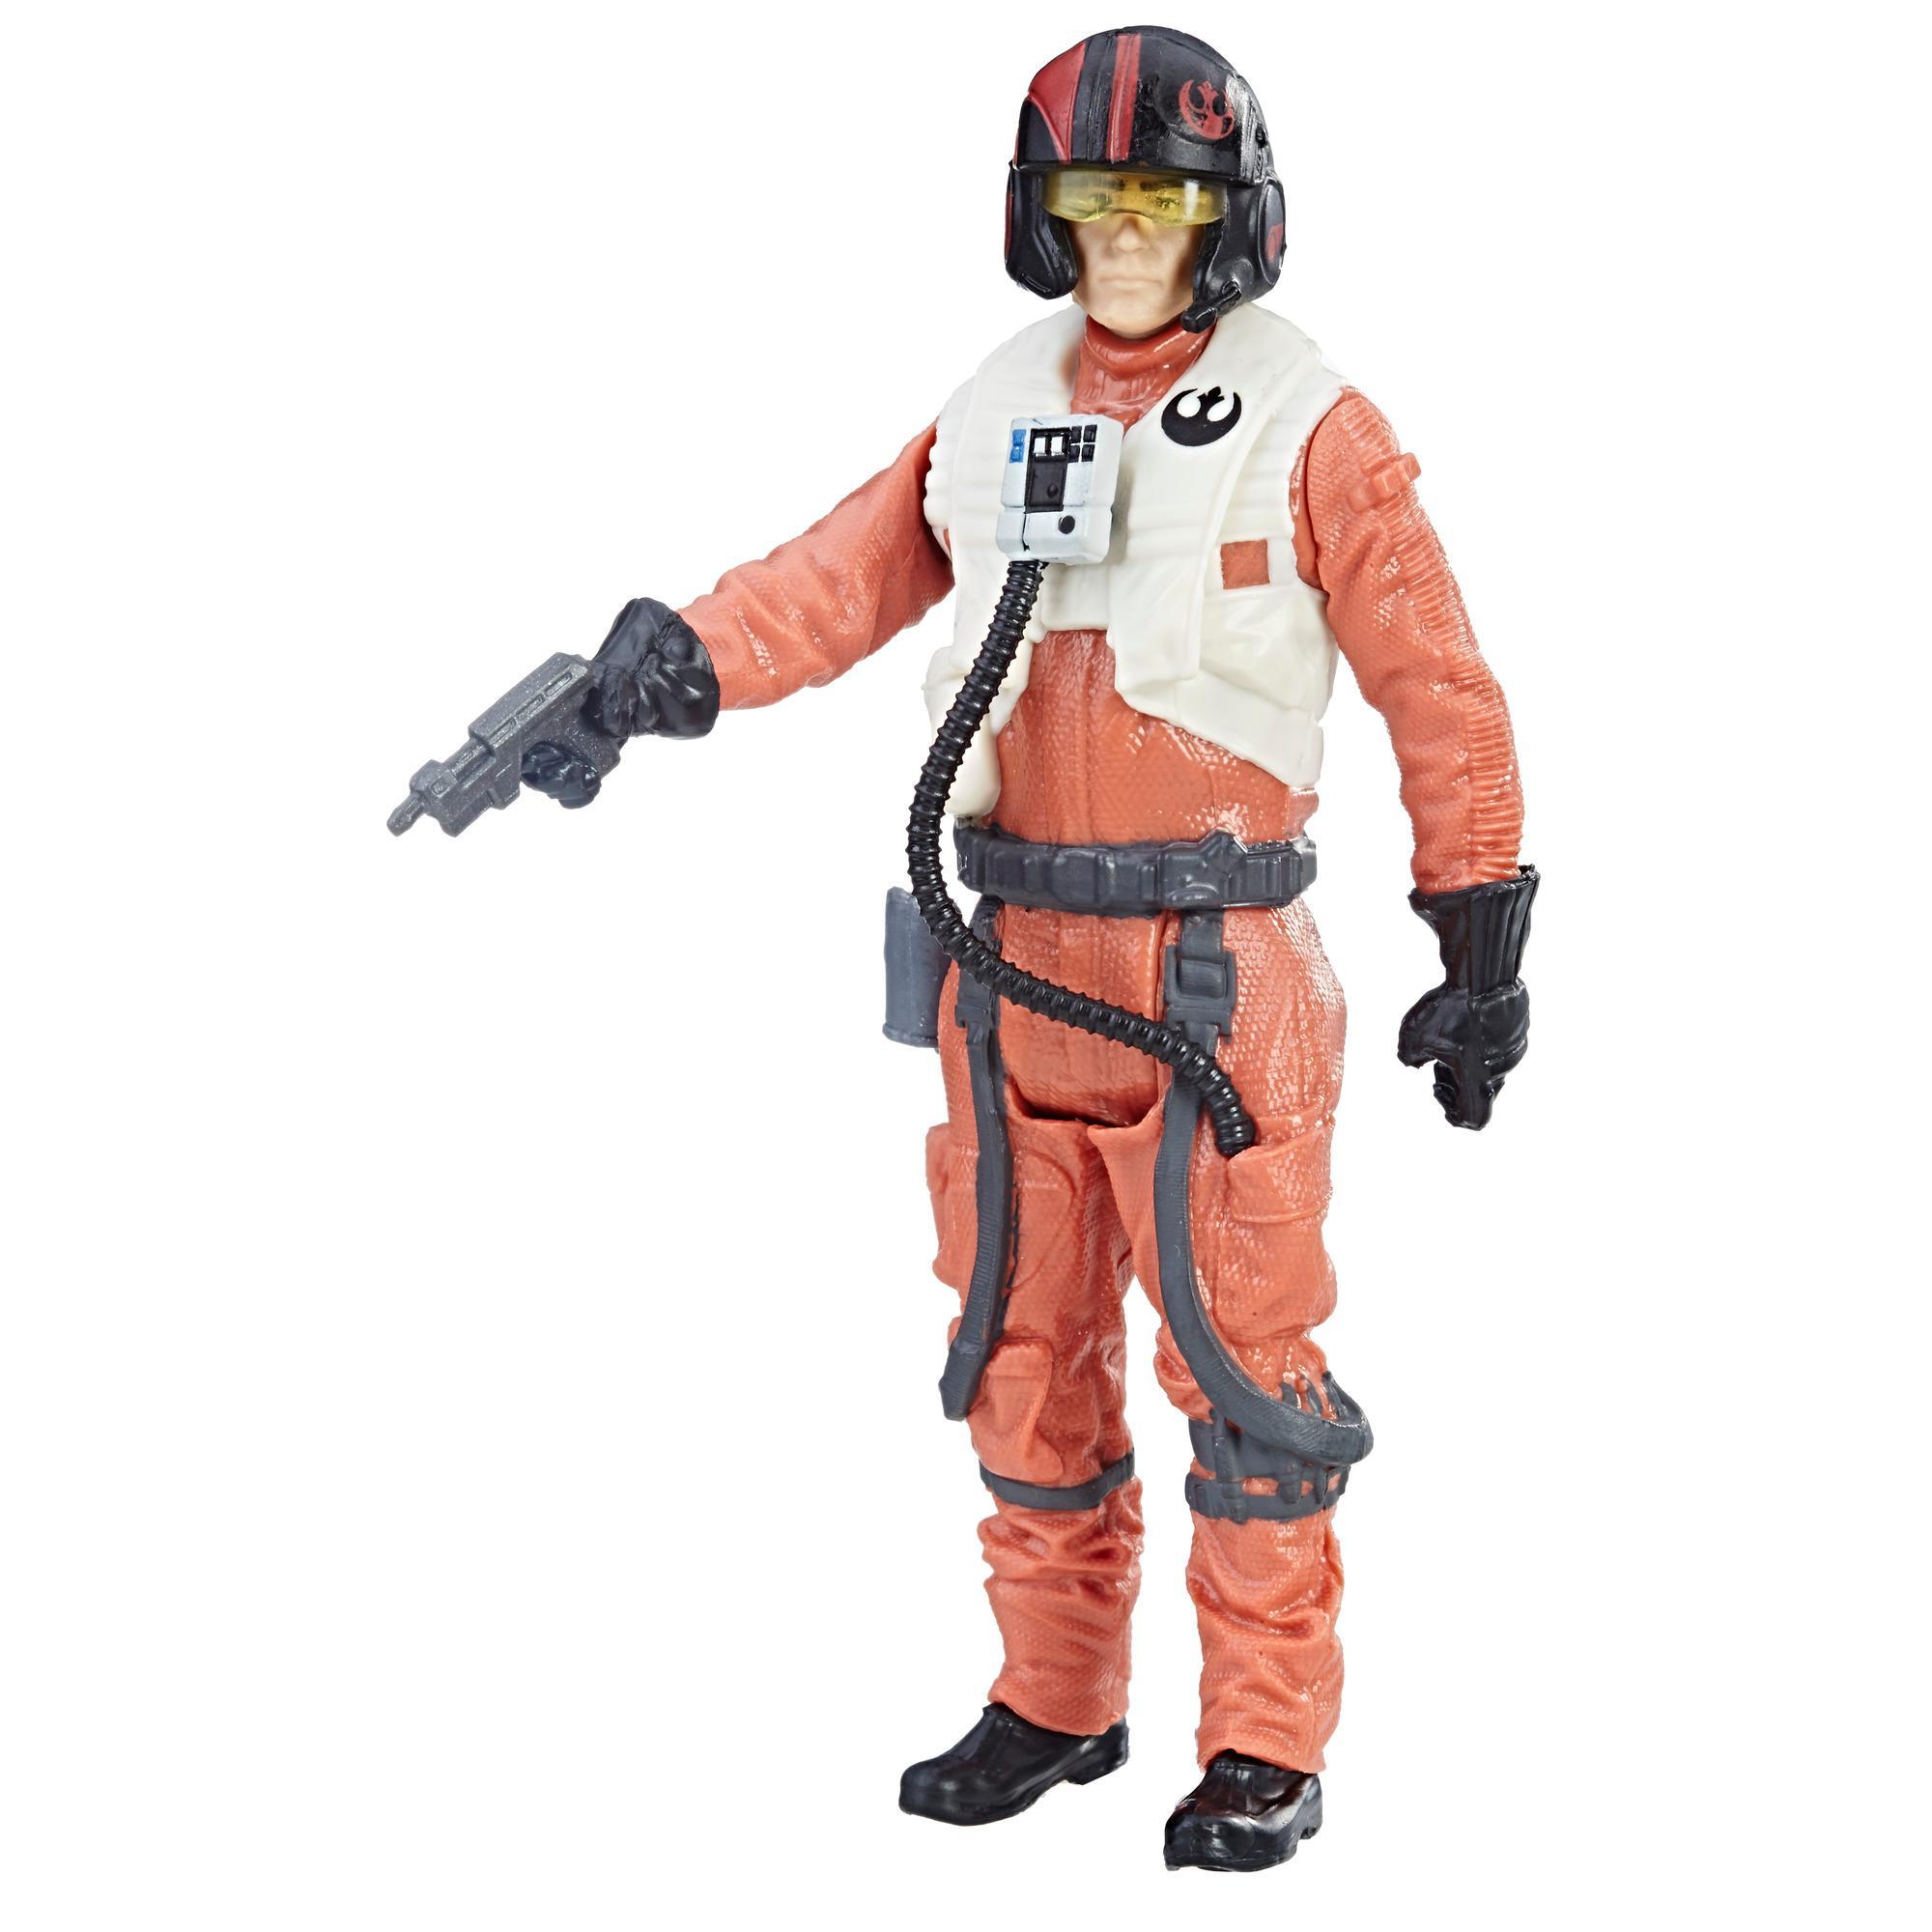 Figura Star Wars Force Link de Poe Dameron (Piloto da Resistência)